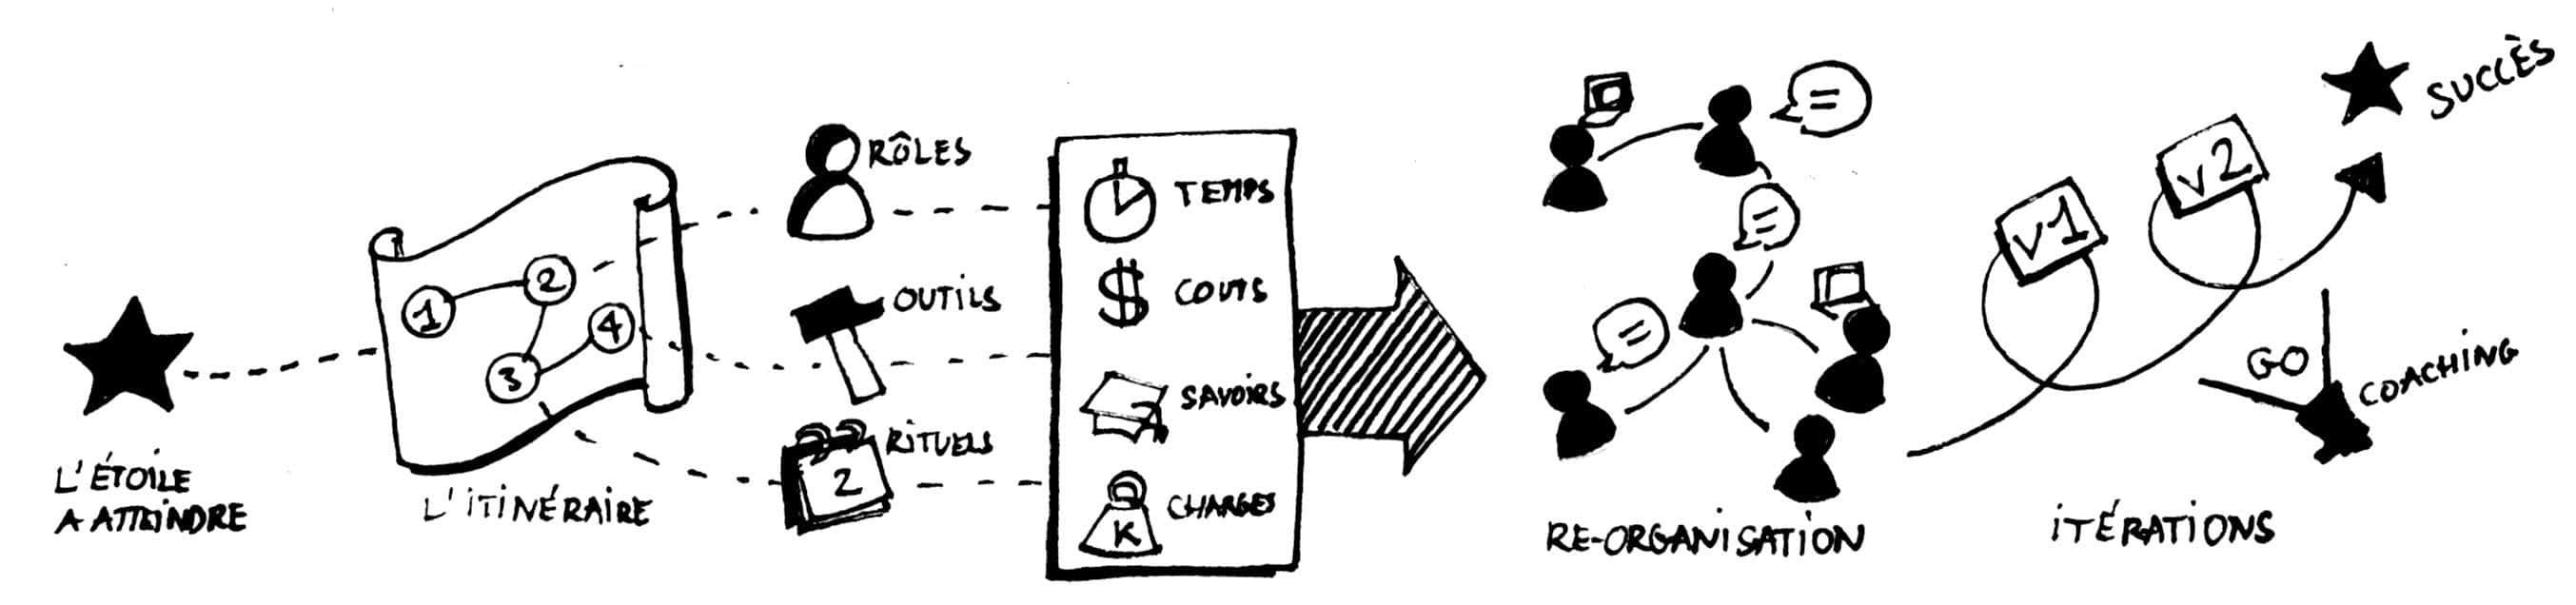 Design d'organisation